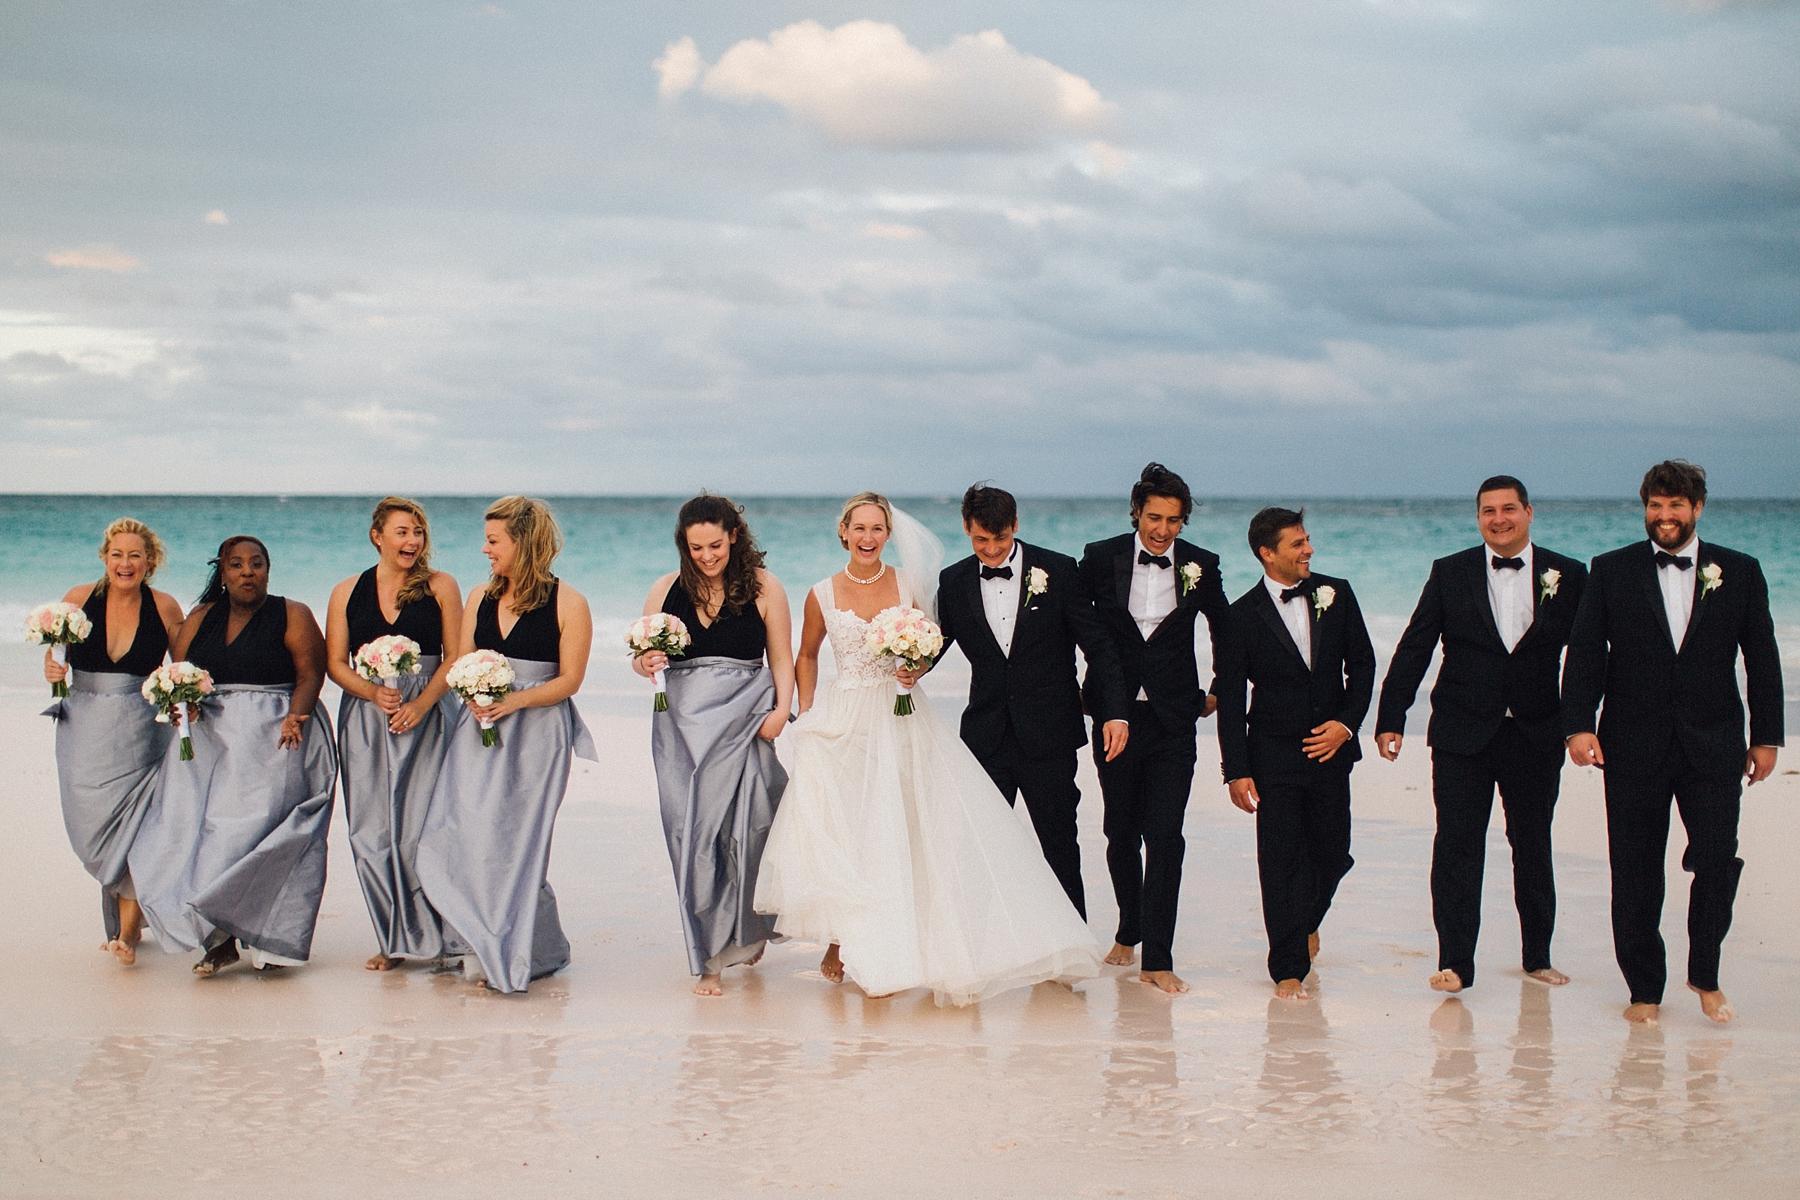 intimate-destination-wedding-beach-moments-harbour-island_0058.jpg